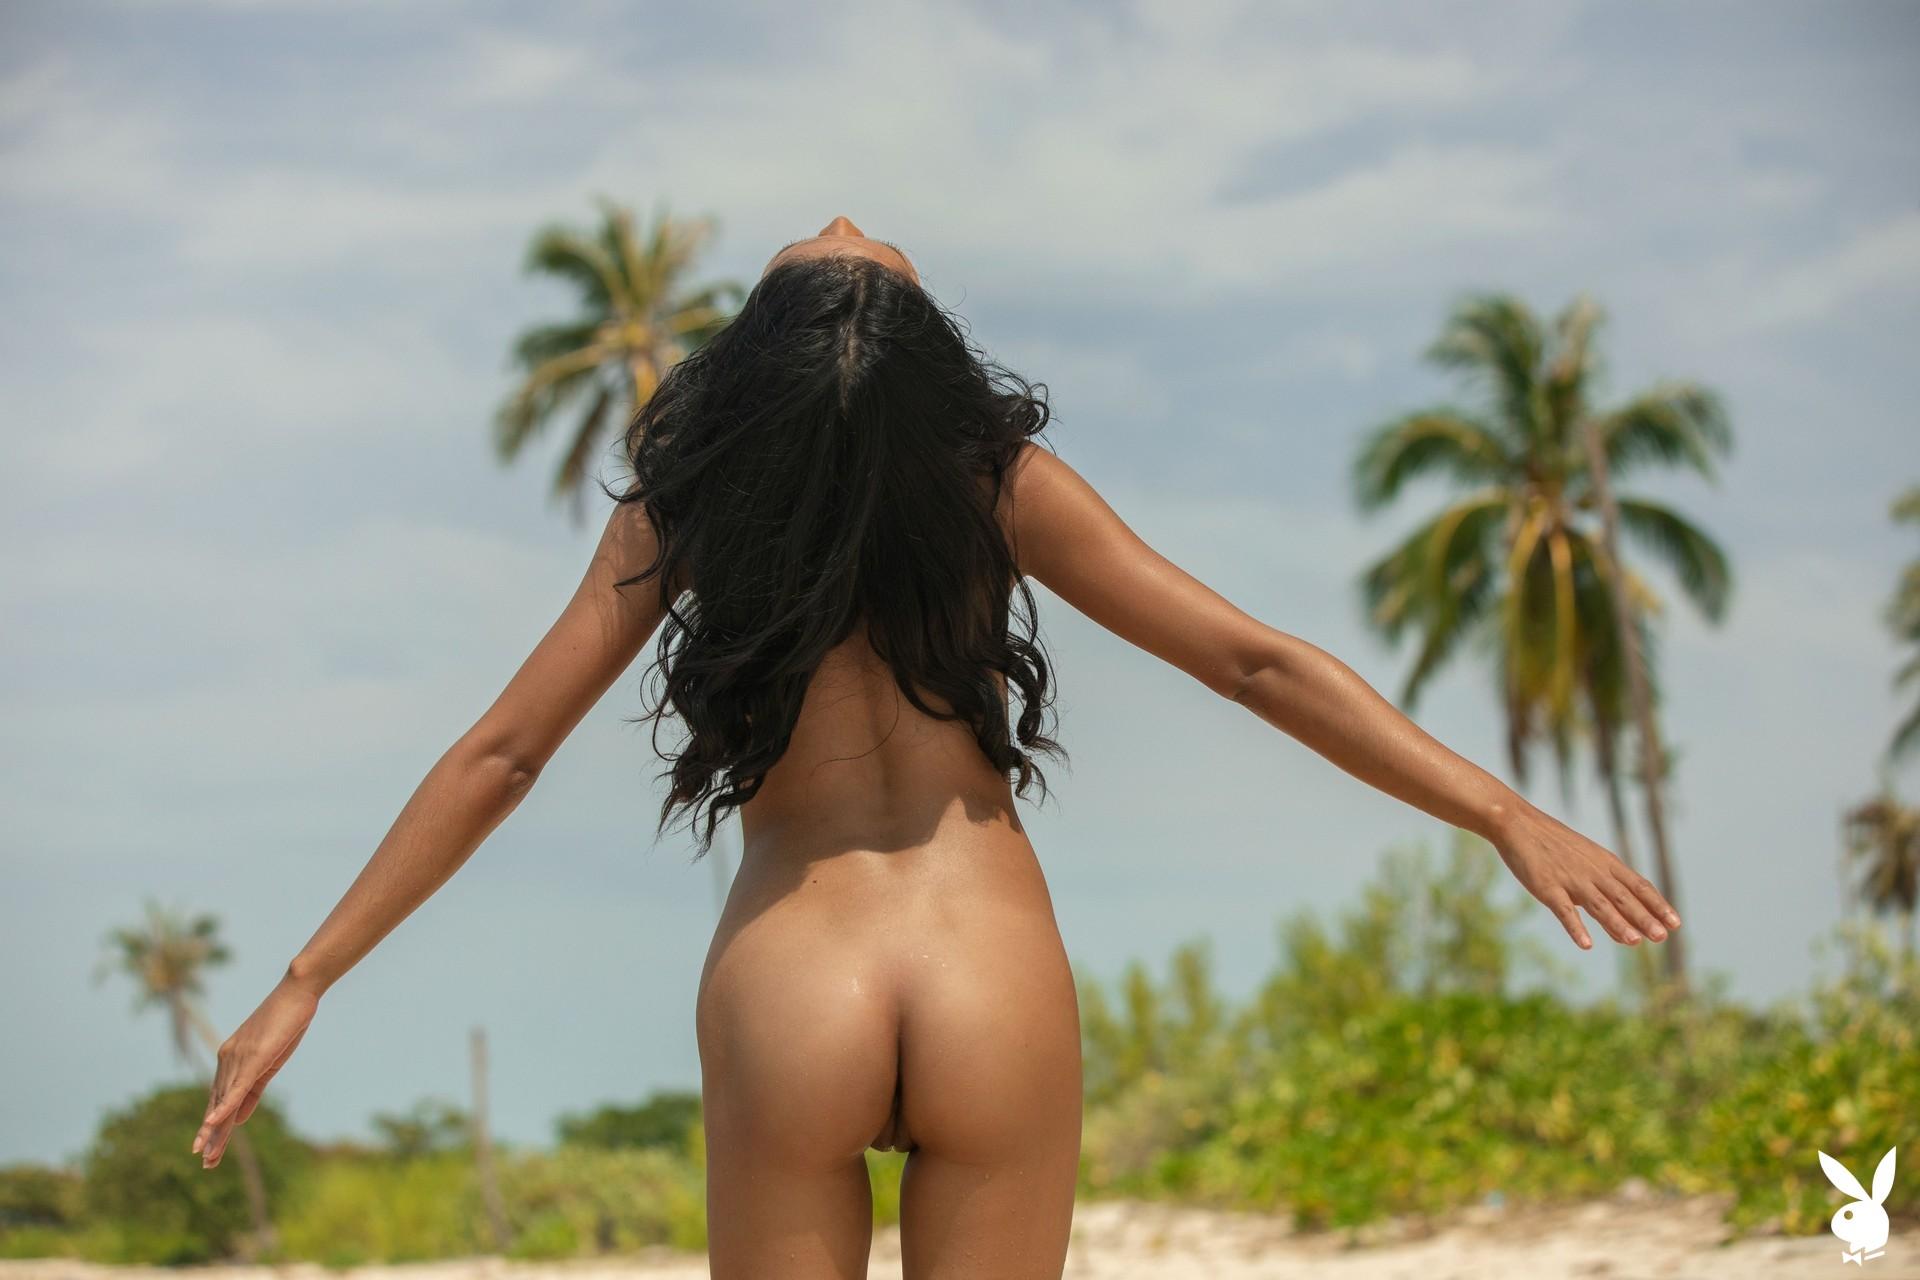 Magen Hana In Island Mentality Playboy Plus (29)